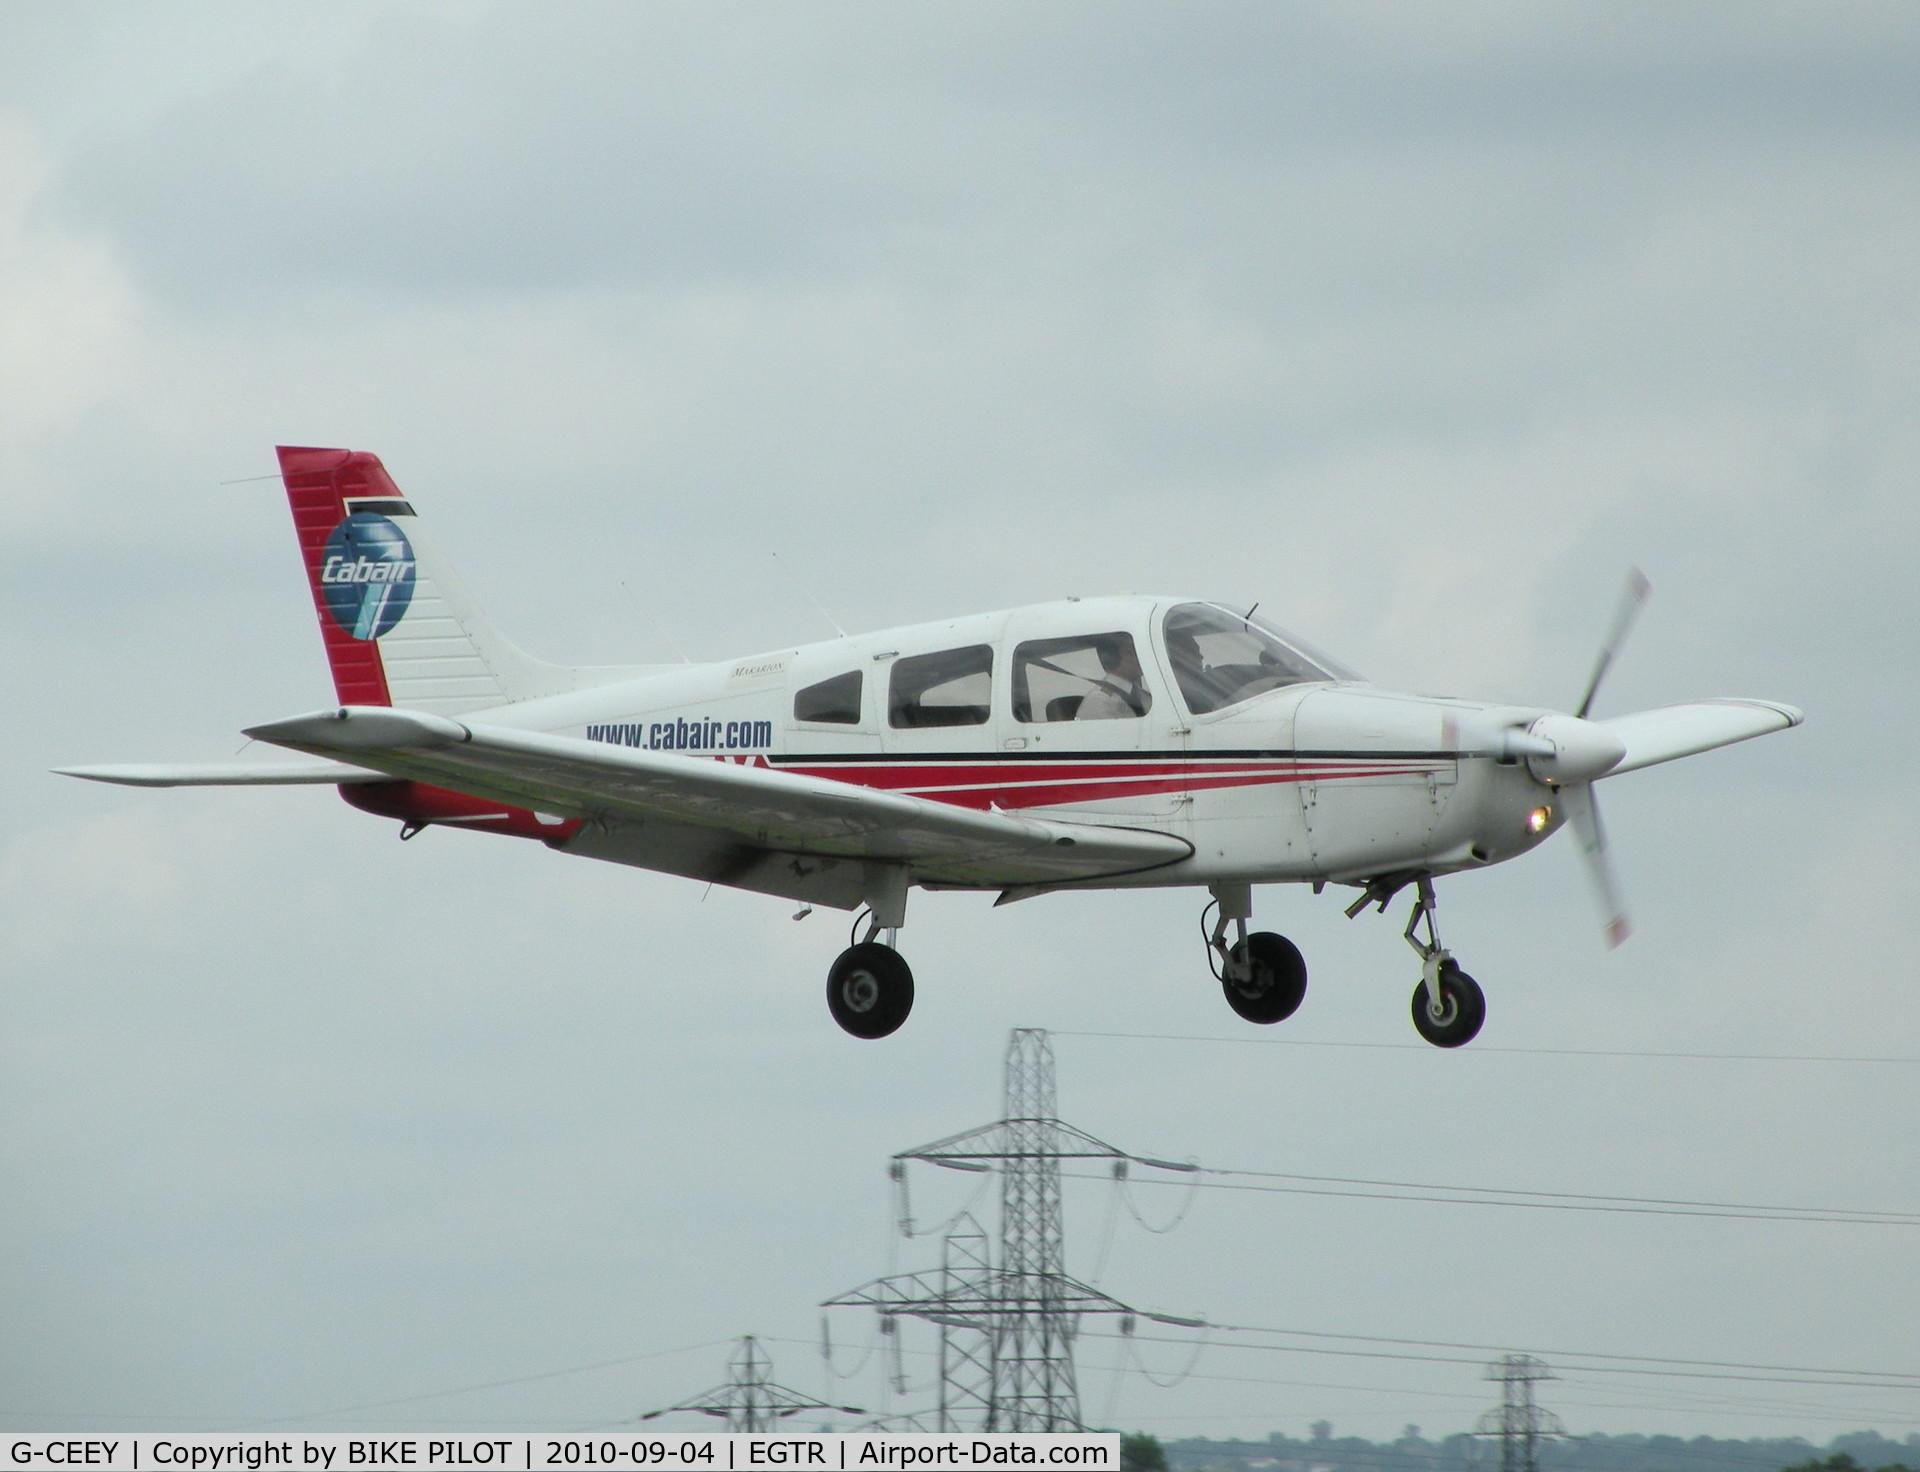 G-CEEY, 2002 Piper PA-28-161 Warrior III C/N 2842168, Cabair Warrior on finals rwy 08